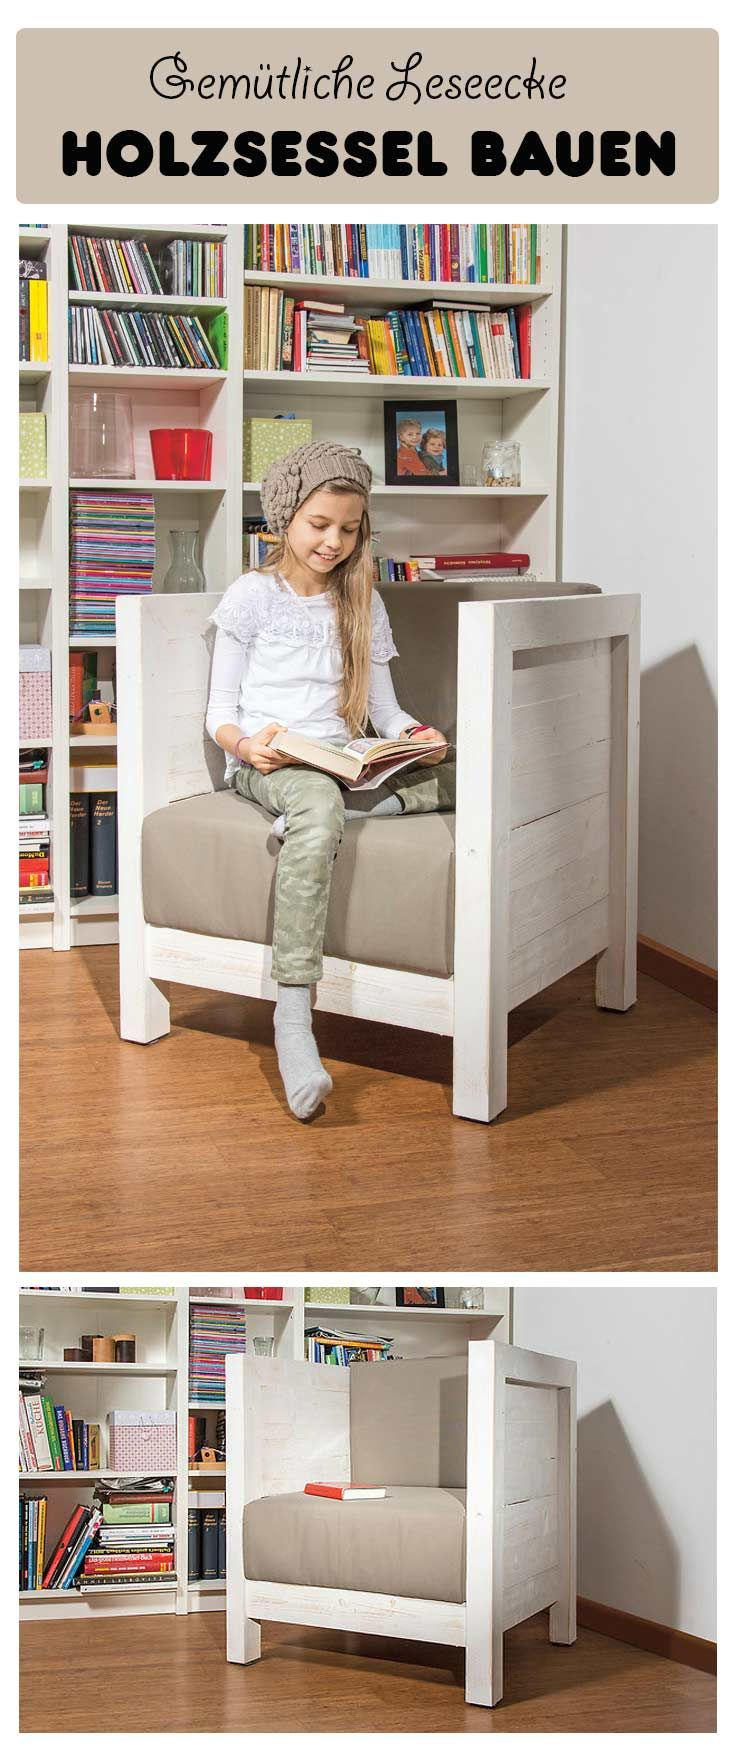 holzsessel selber bauen tische st hle holzsessel. Black Bedroom Furniture Sets. Home Design Ideas